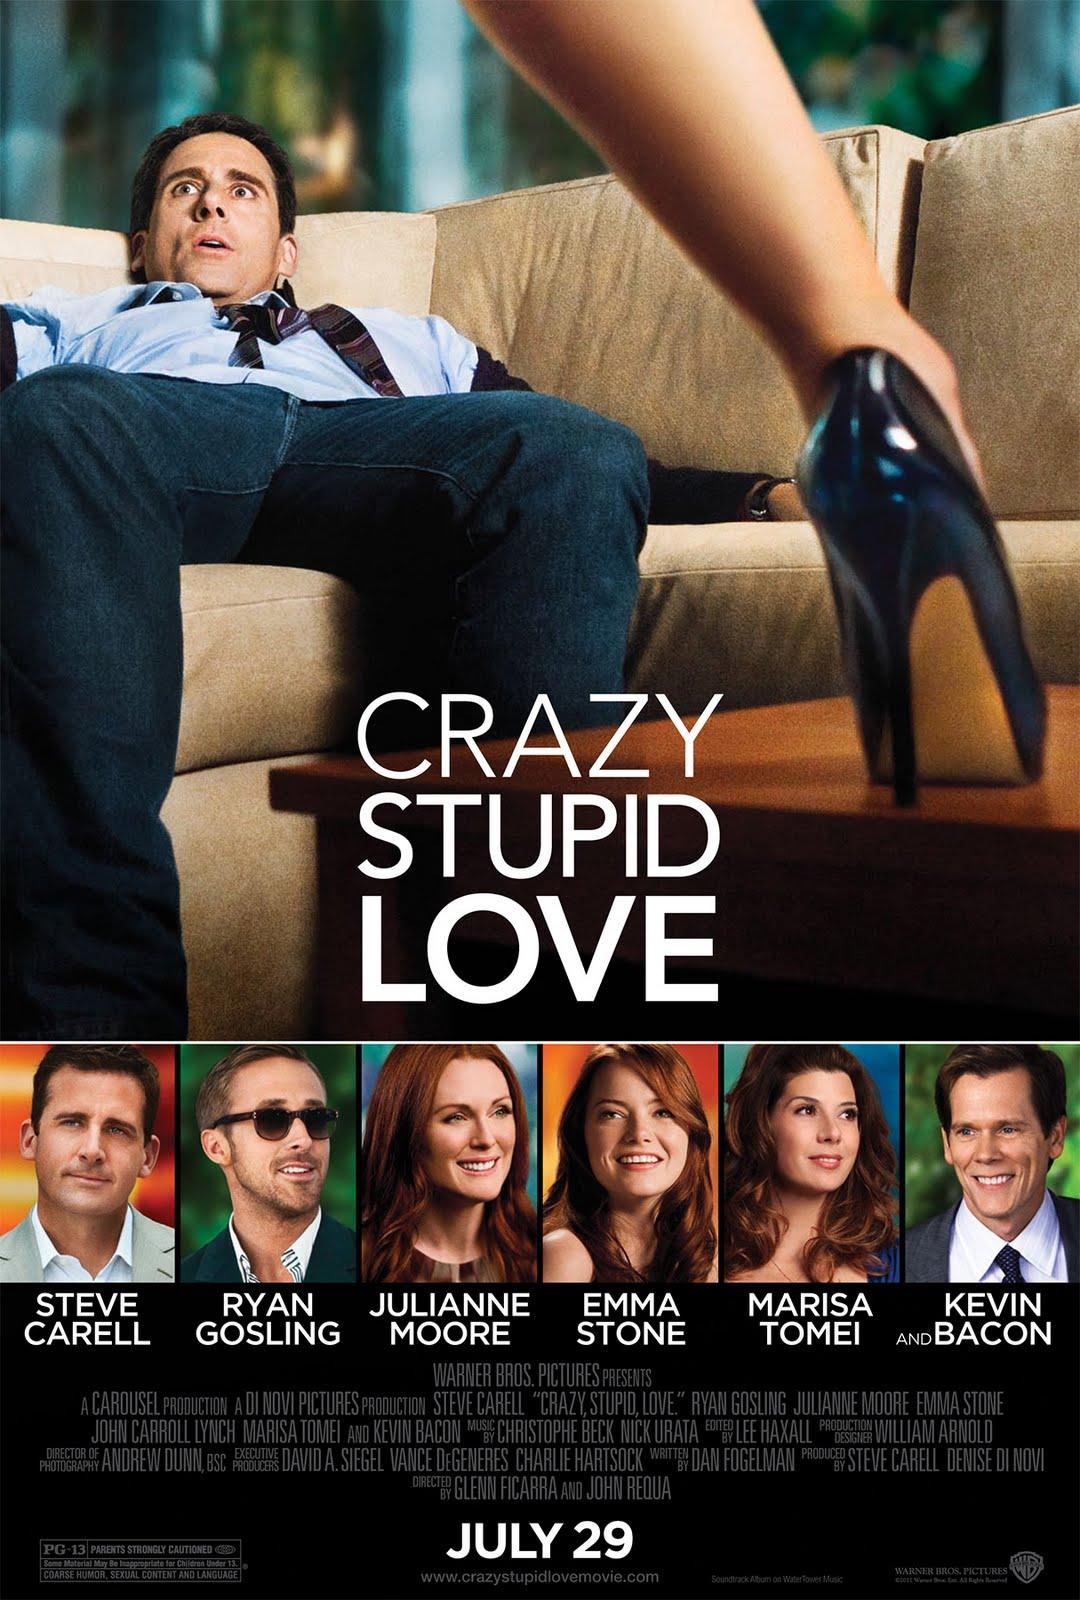 http://1.bp.blogspot.com/-Q3gY5IOqLUk/TlKnOyFUmUI/AAAAAAAAABU/LXPGH-ssu1c/s1600/crazy-stupid-love-poster1.jpg